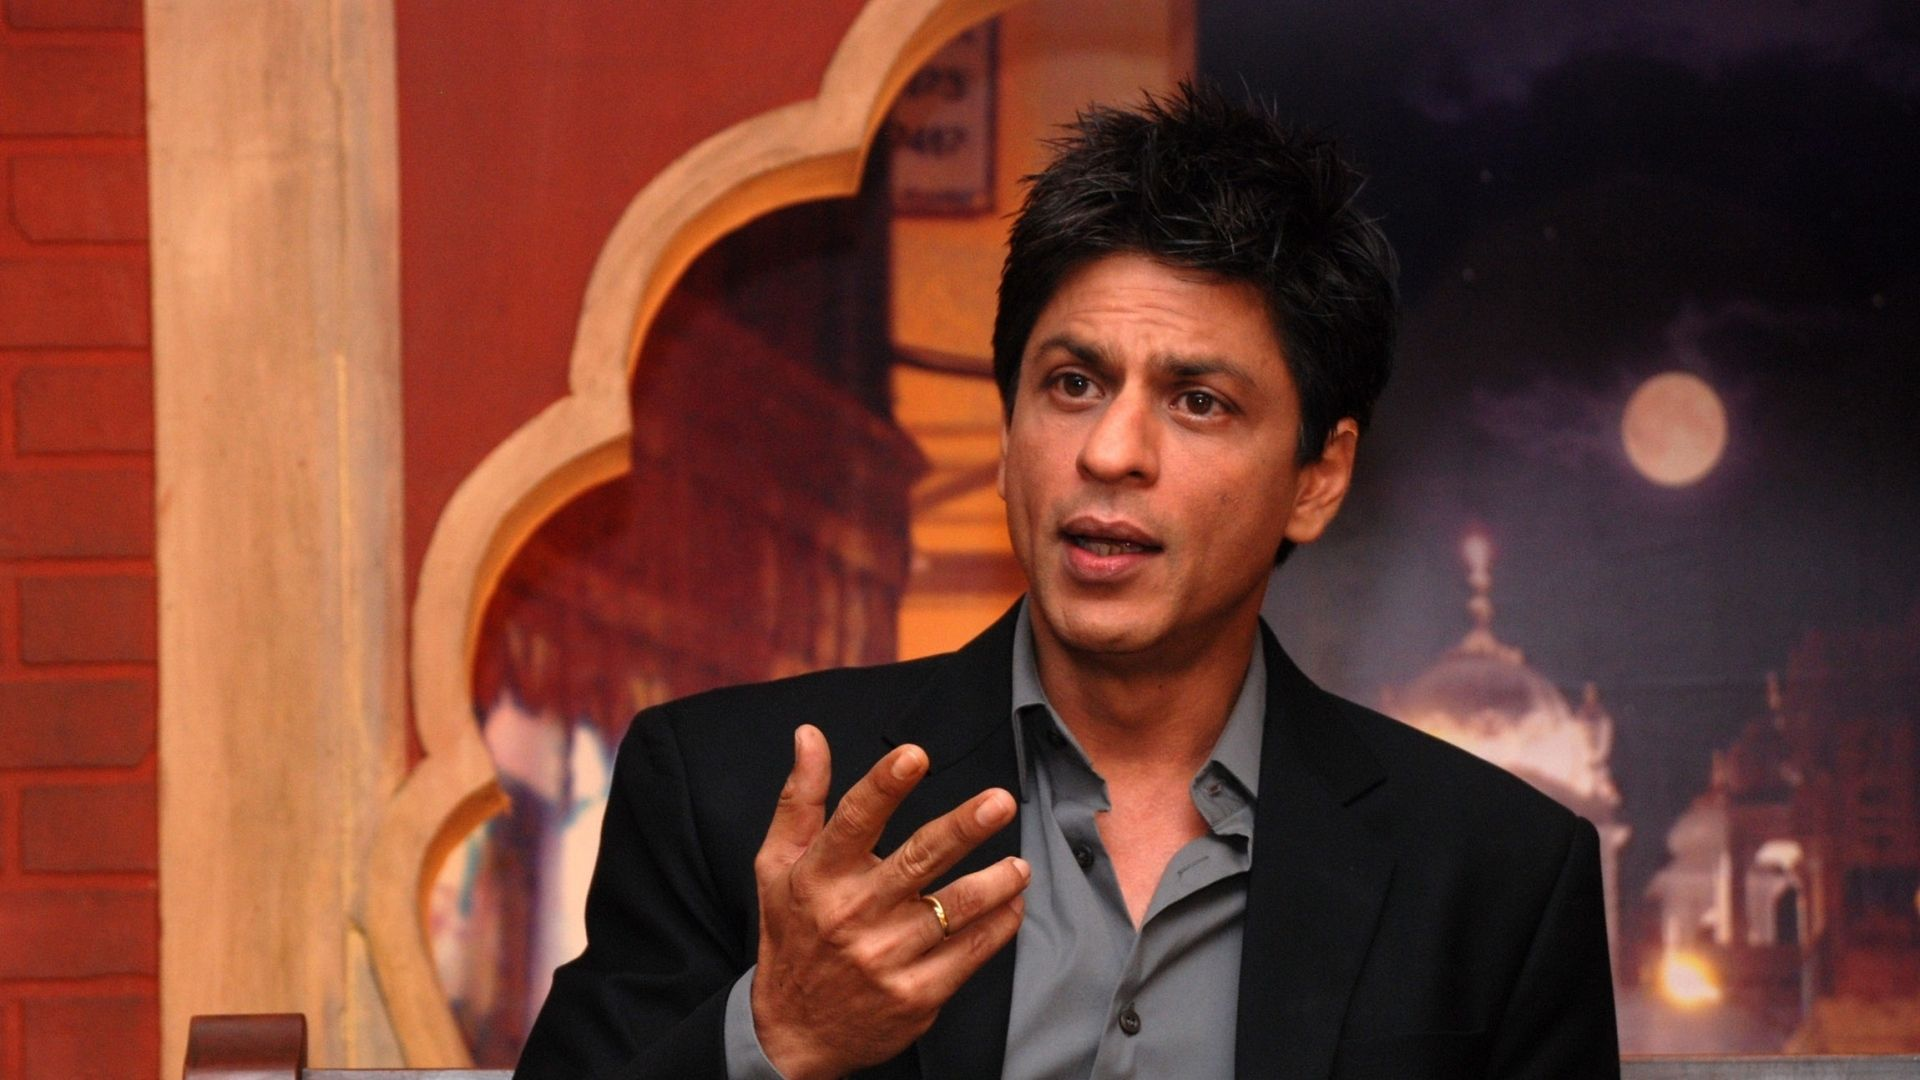 Download Shahrukh Khan Free Hd Wallpaper Background Image Hd